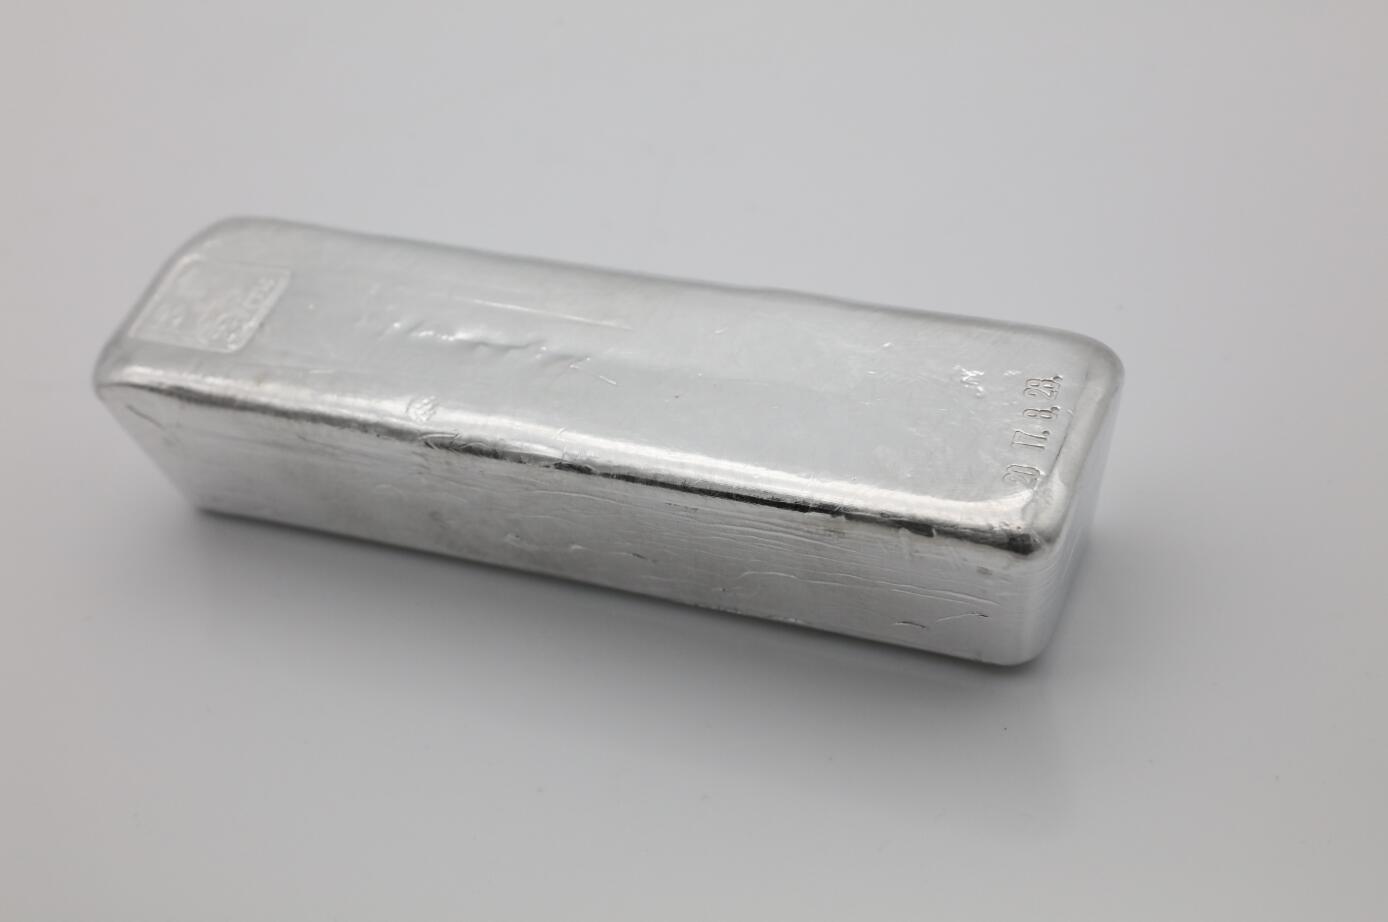 High Purity 99.995% Indium Metal Ingot 1kg For Sale